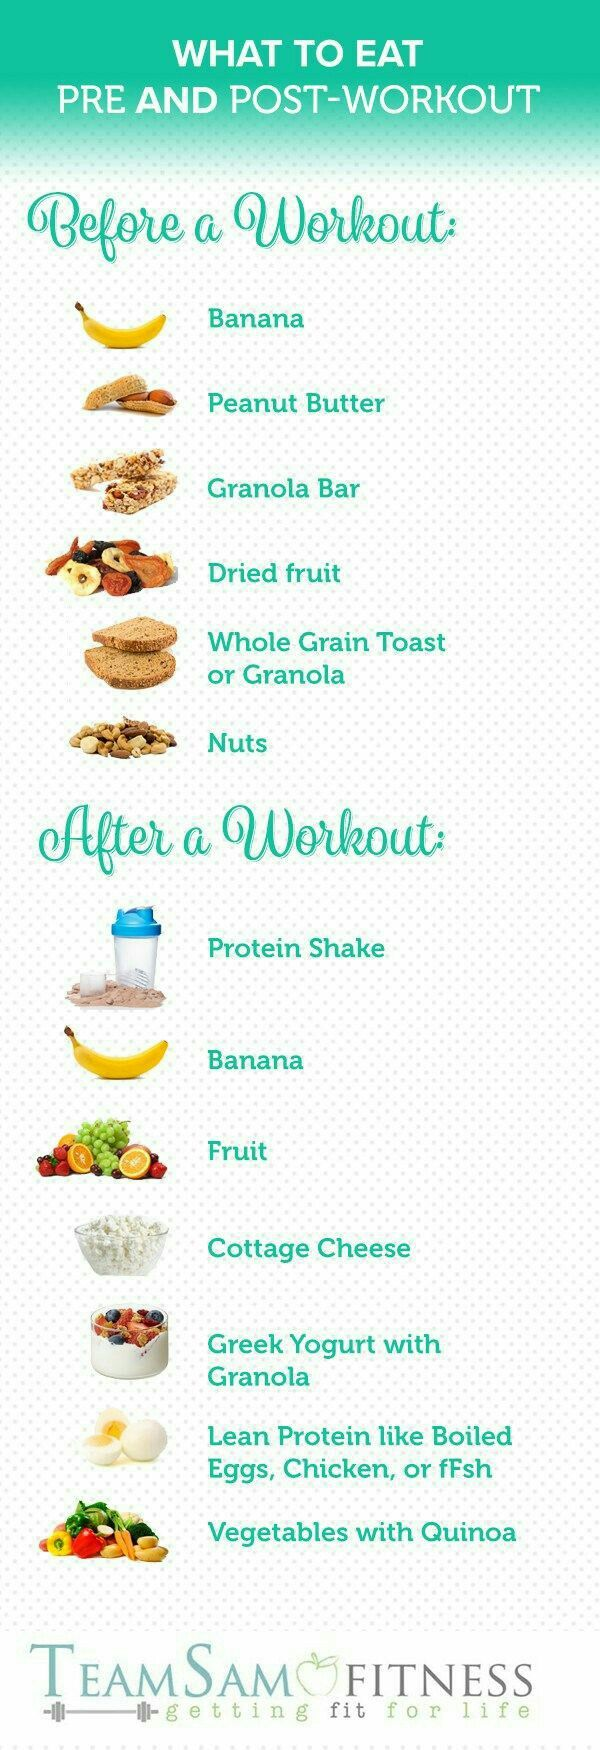 Pin by haniya malik on Health & Beauty   Workout food, Post ...